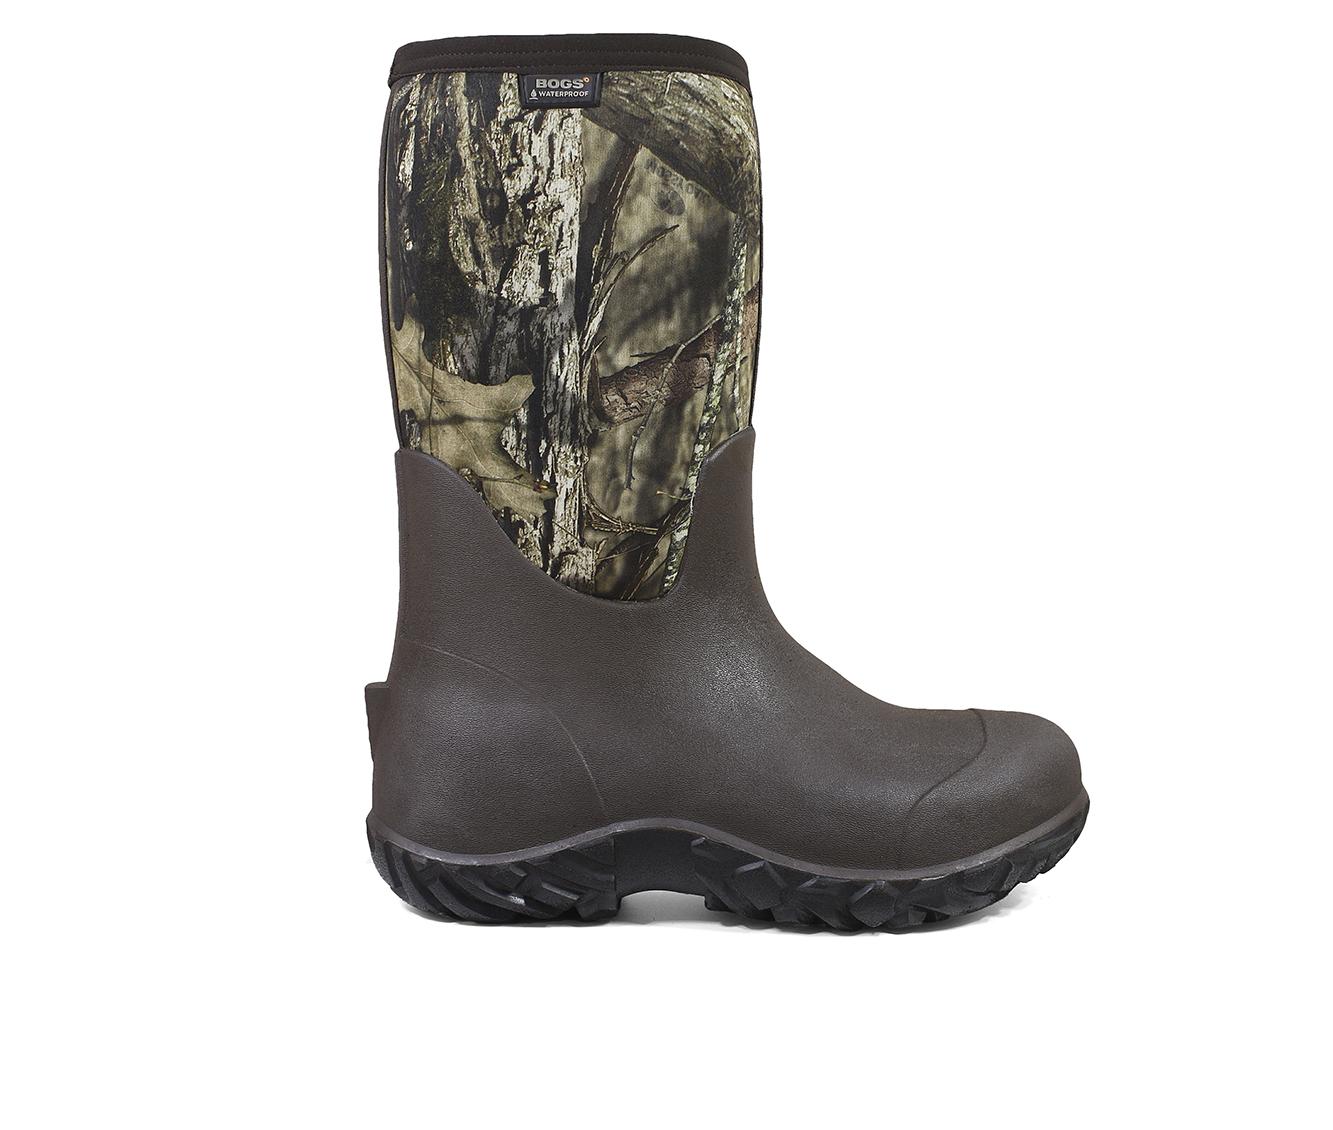 Bogs Footwear Warner Extreme Men's Boots (Multi-color Fabric)